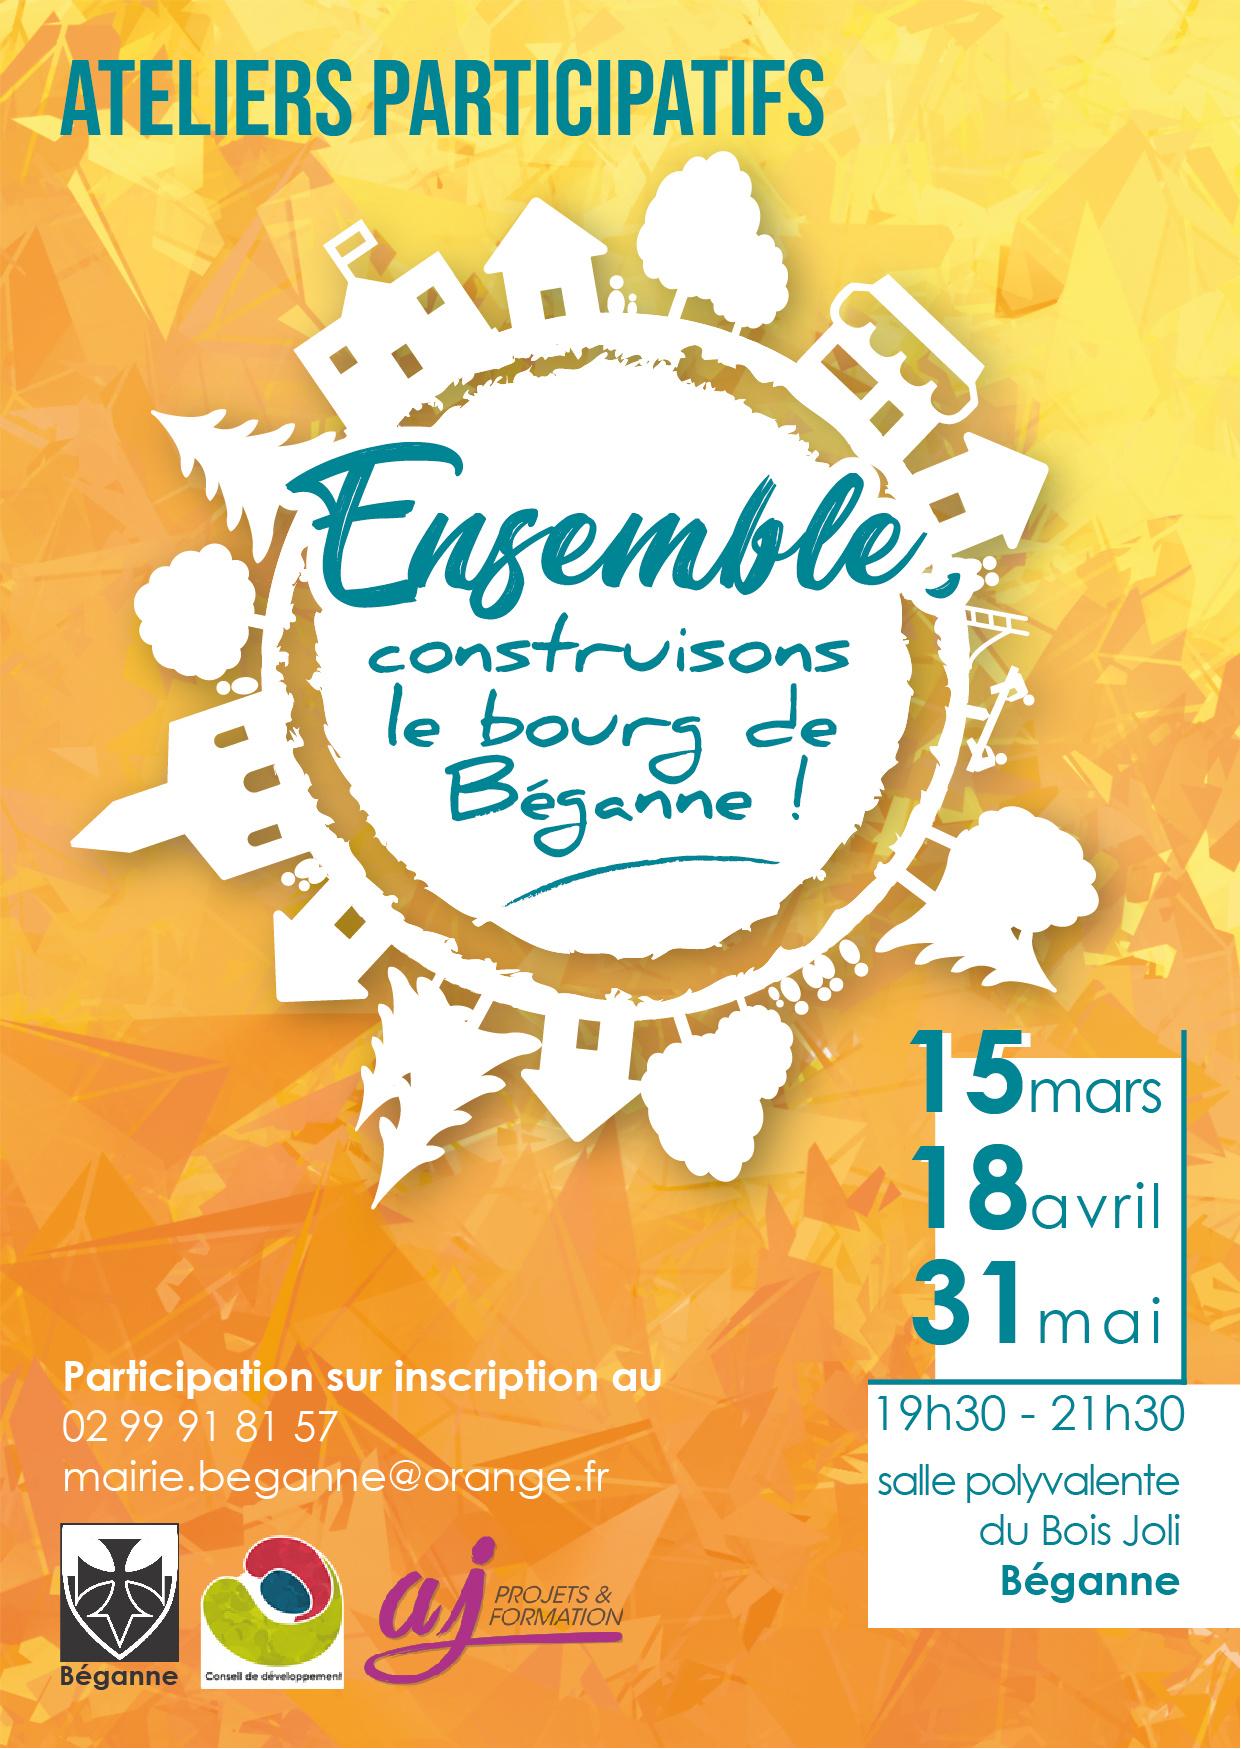 ConcertationBégane_Test5